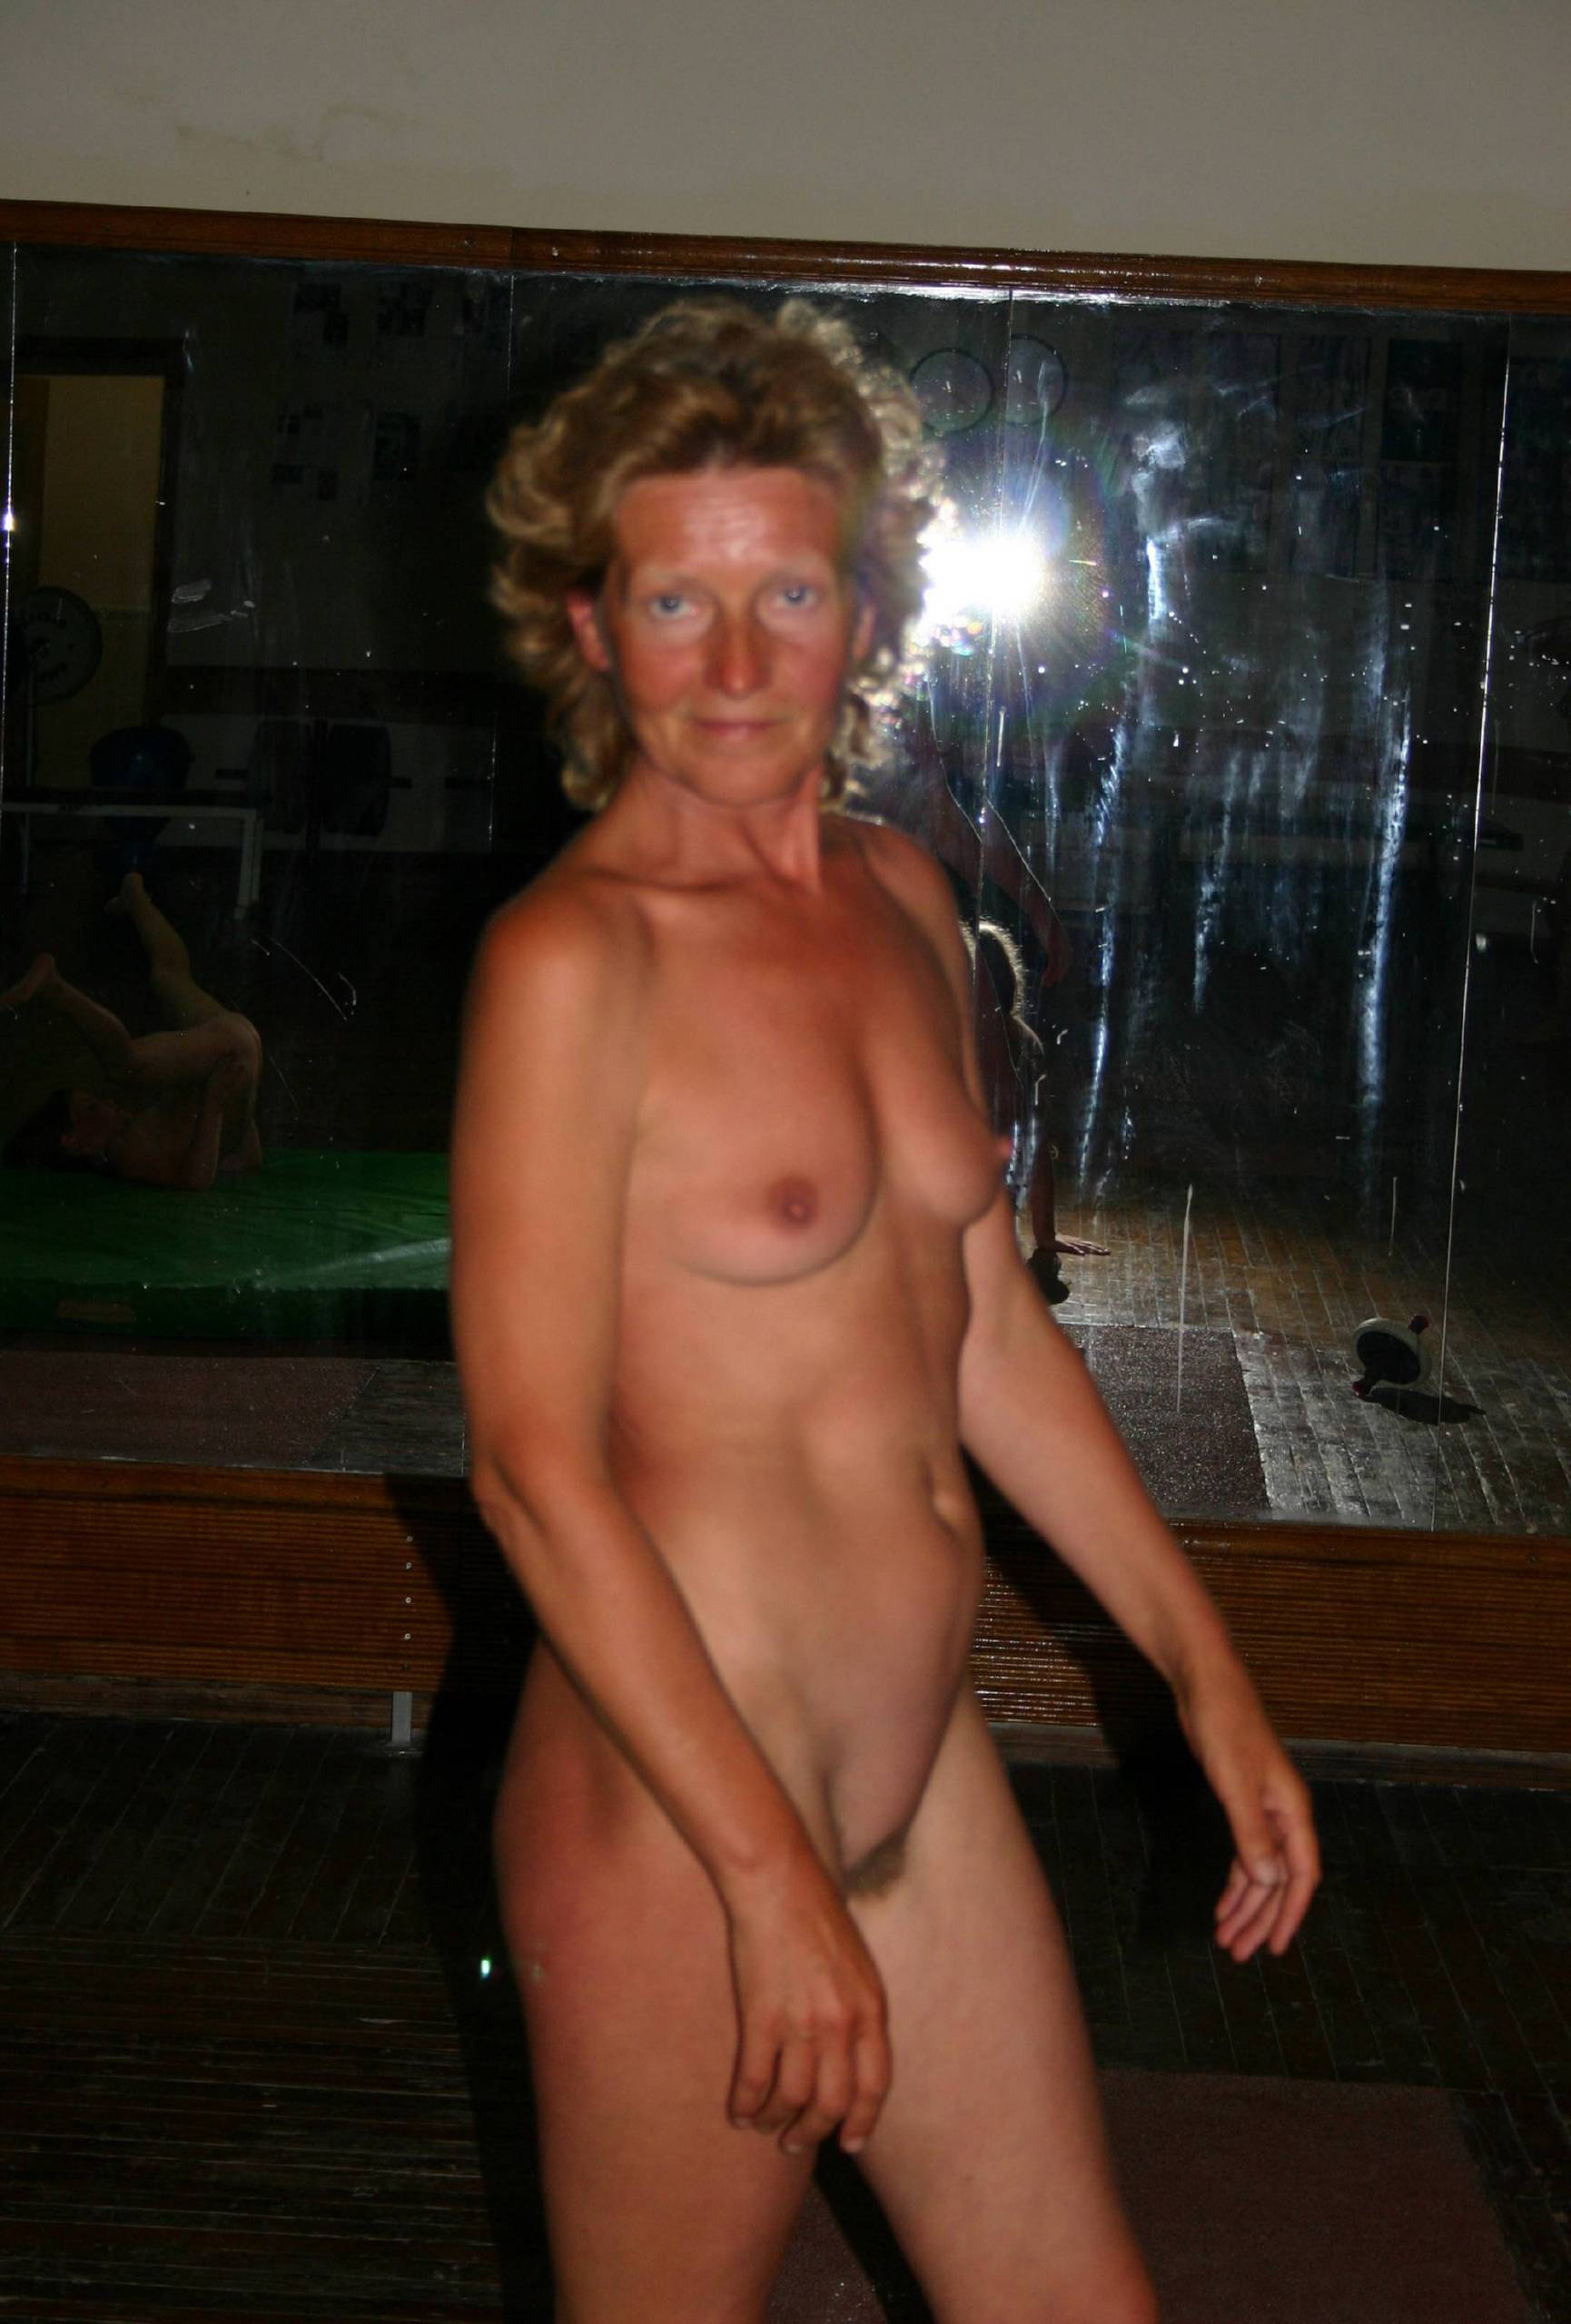 Nudist Photos Family Nudist Gym Shots - 2